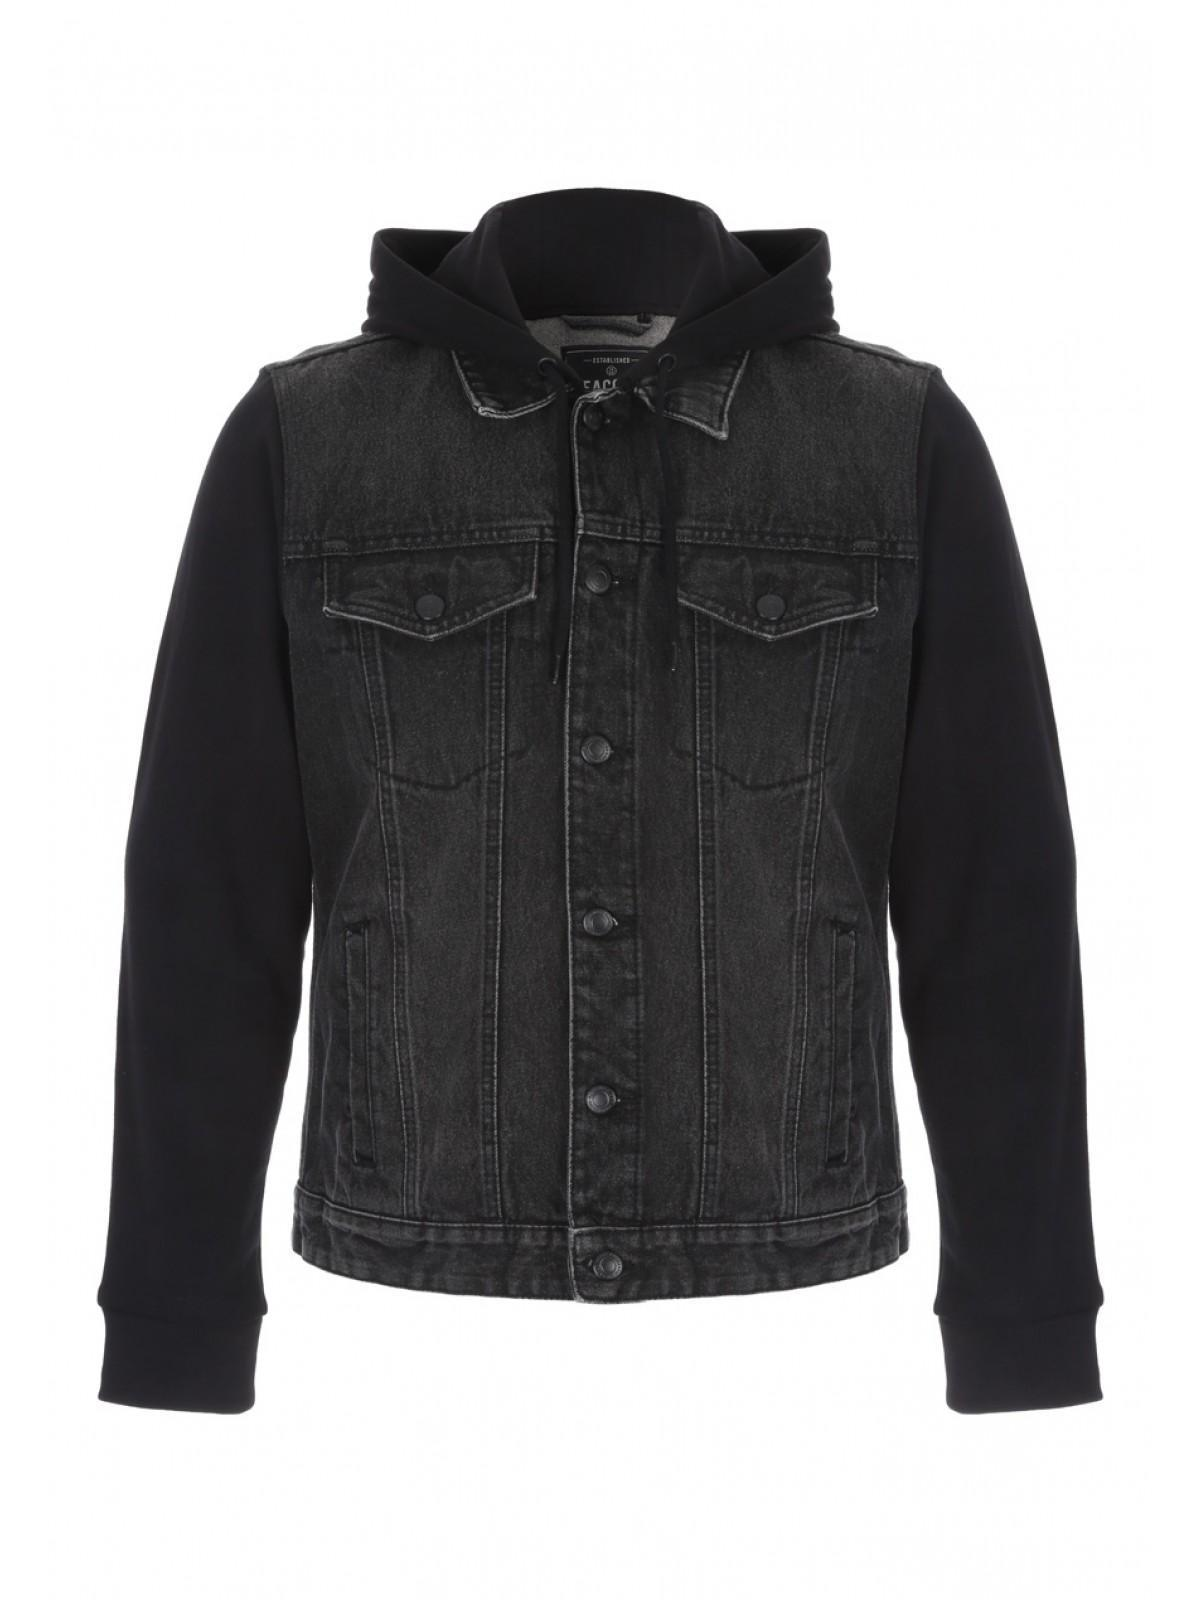 Black denim jacket mens uk